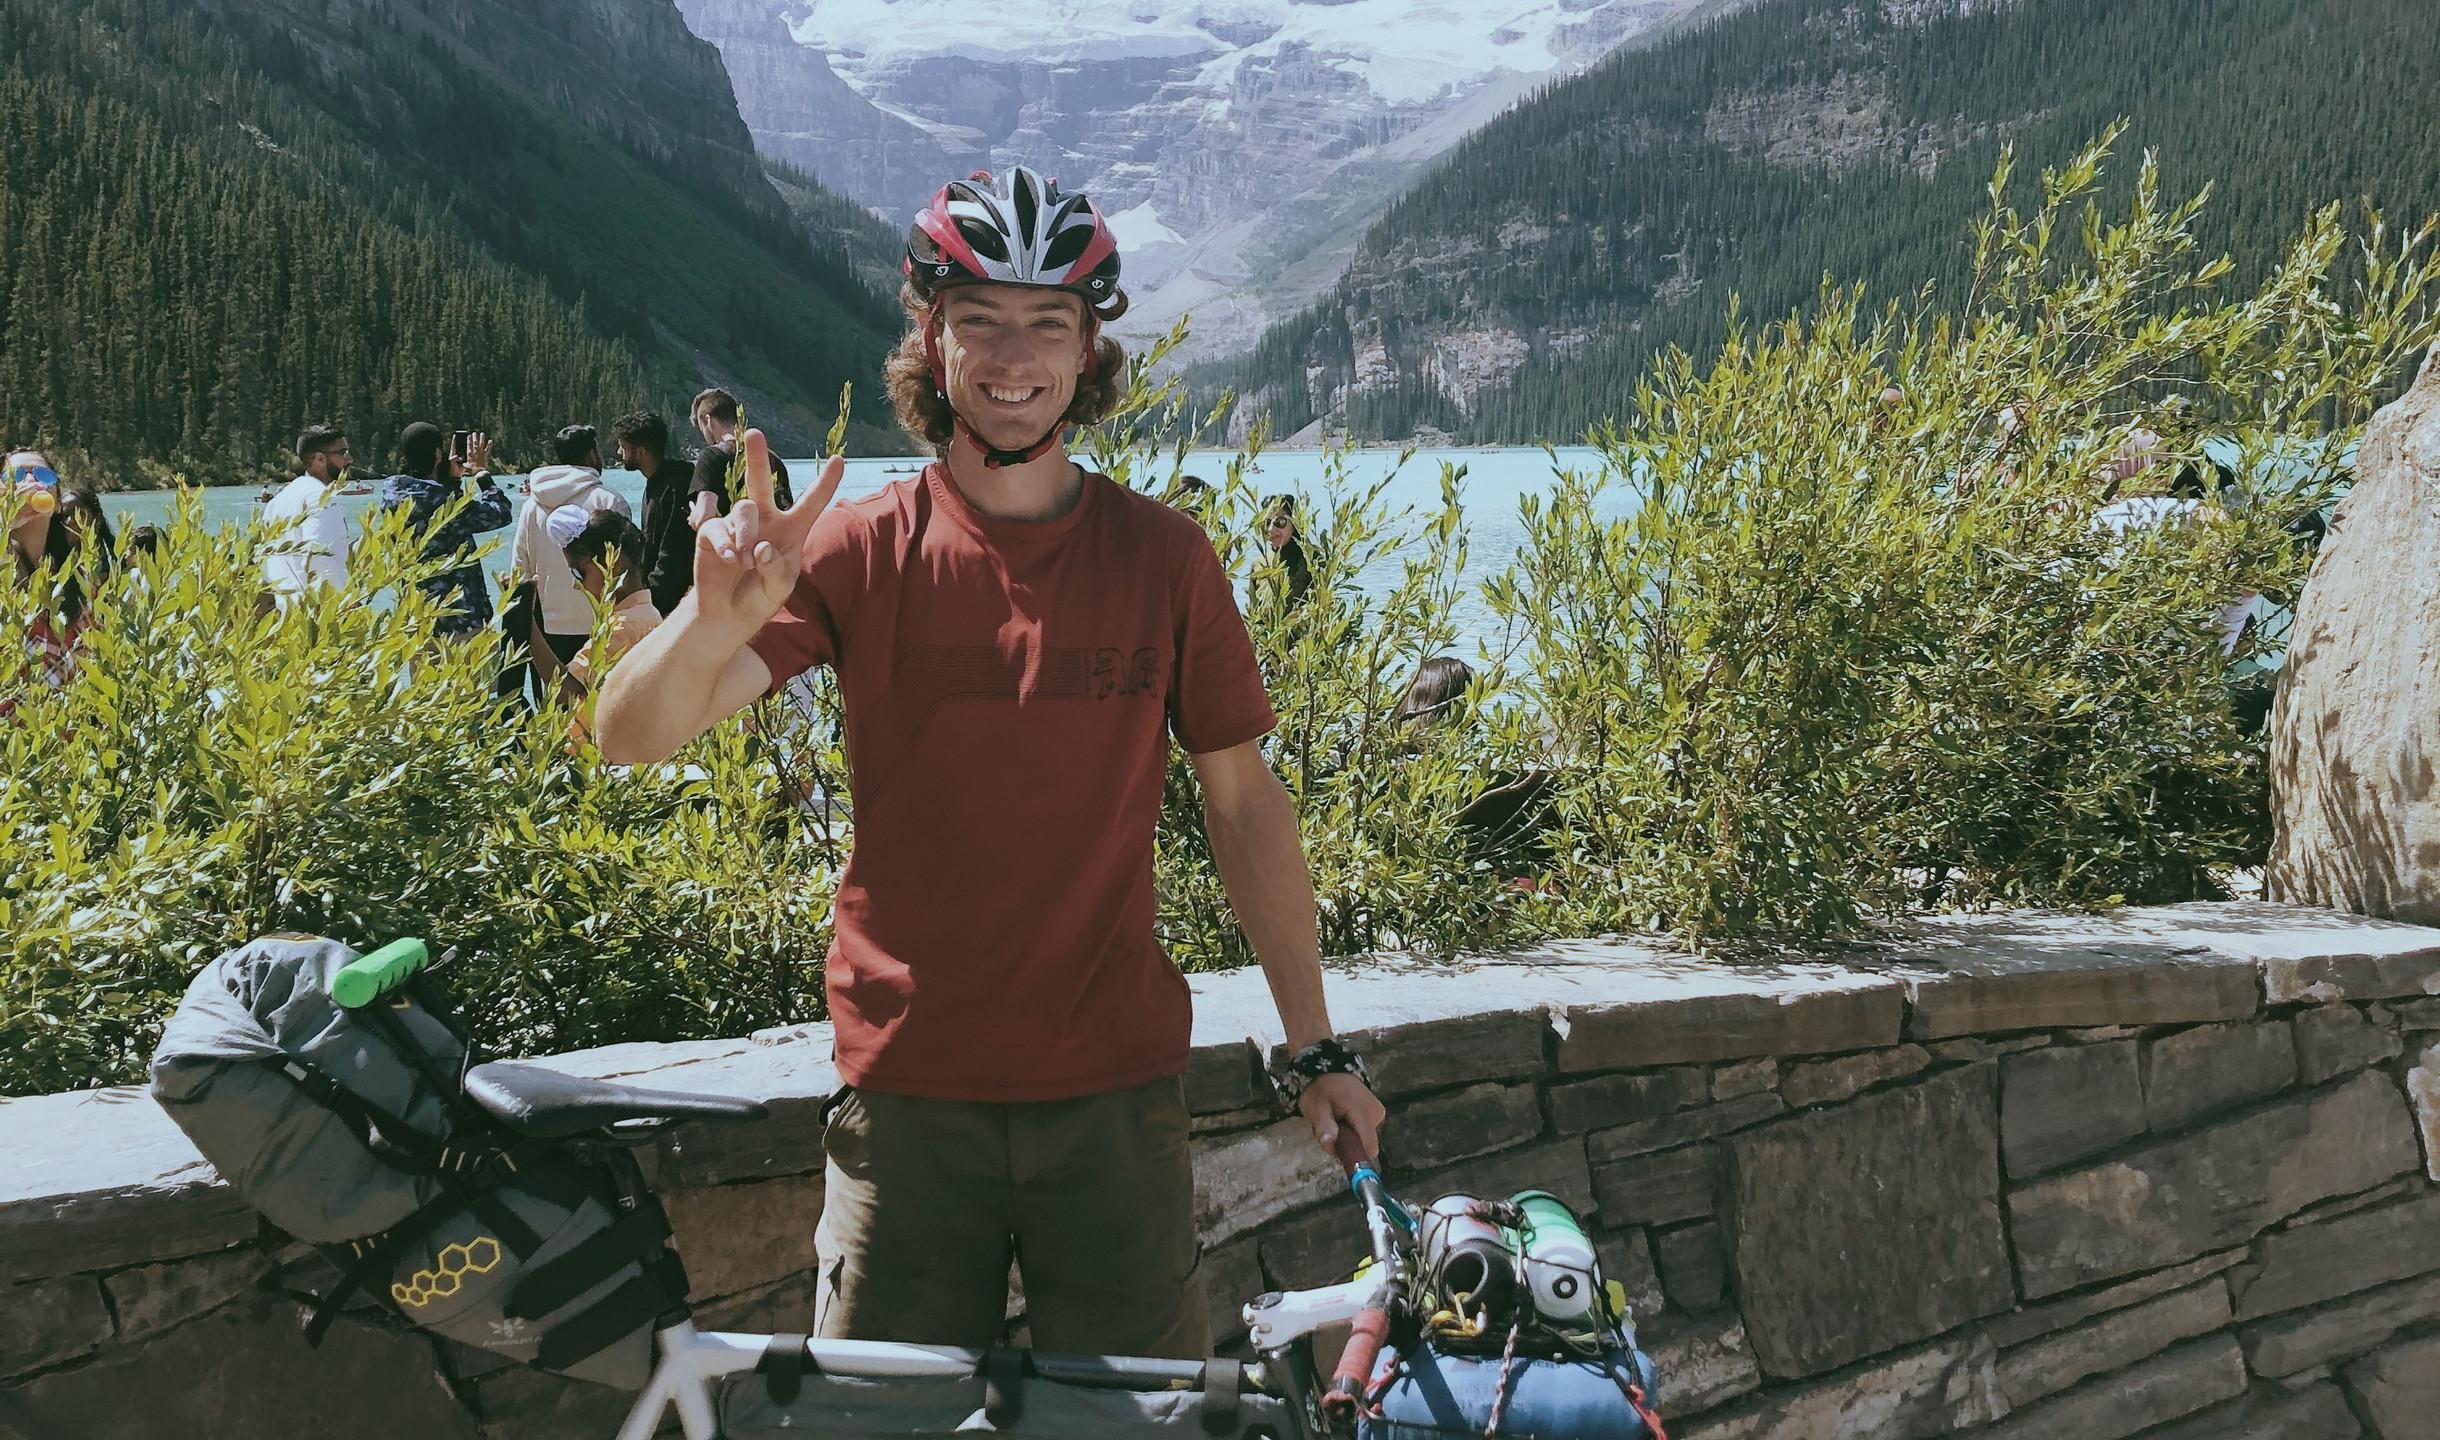 Rider happy smiling with fixie bike next to lake